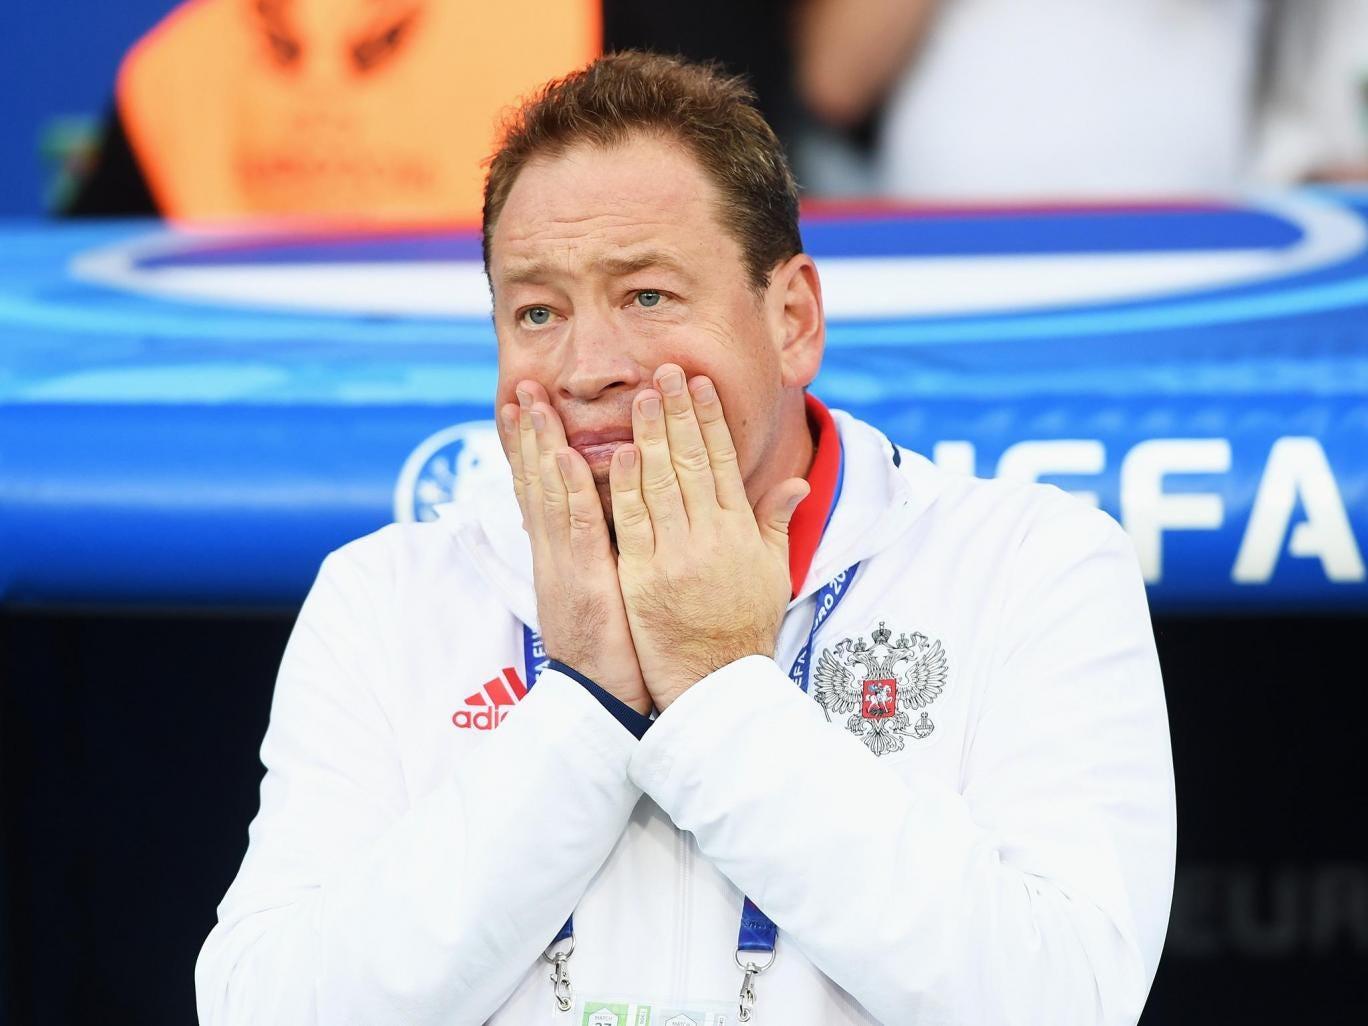 Mutko: Leonid Slutsky resigns as national team coach 25.06.2016 38